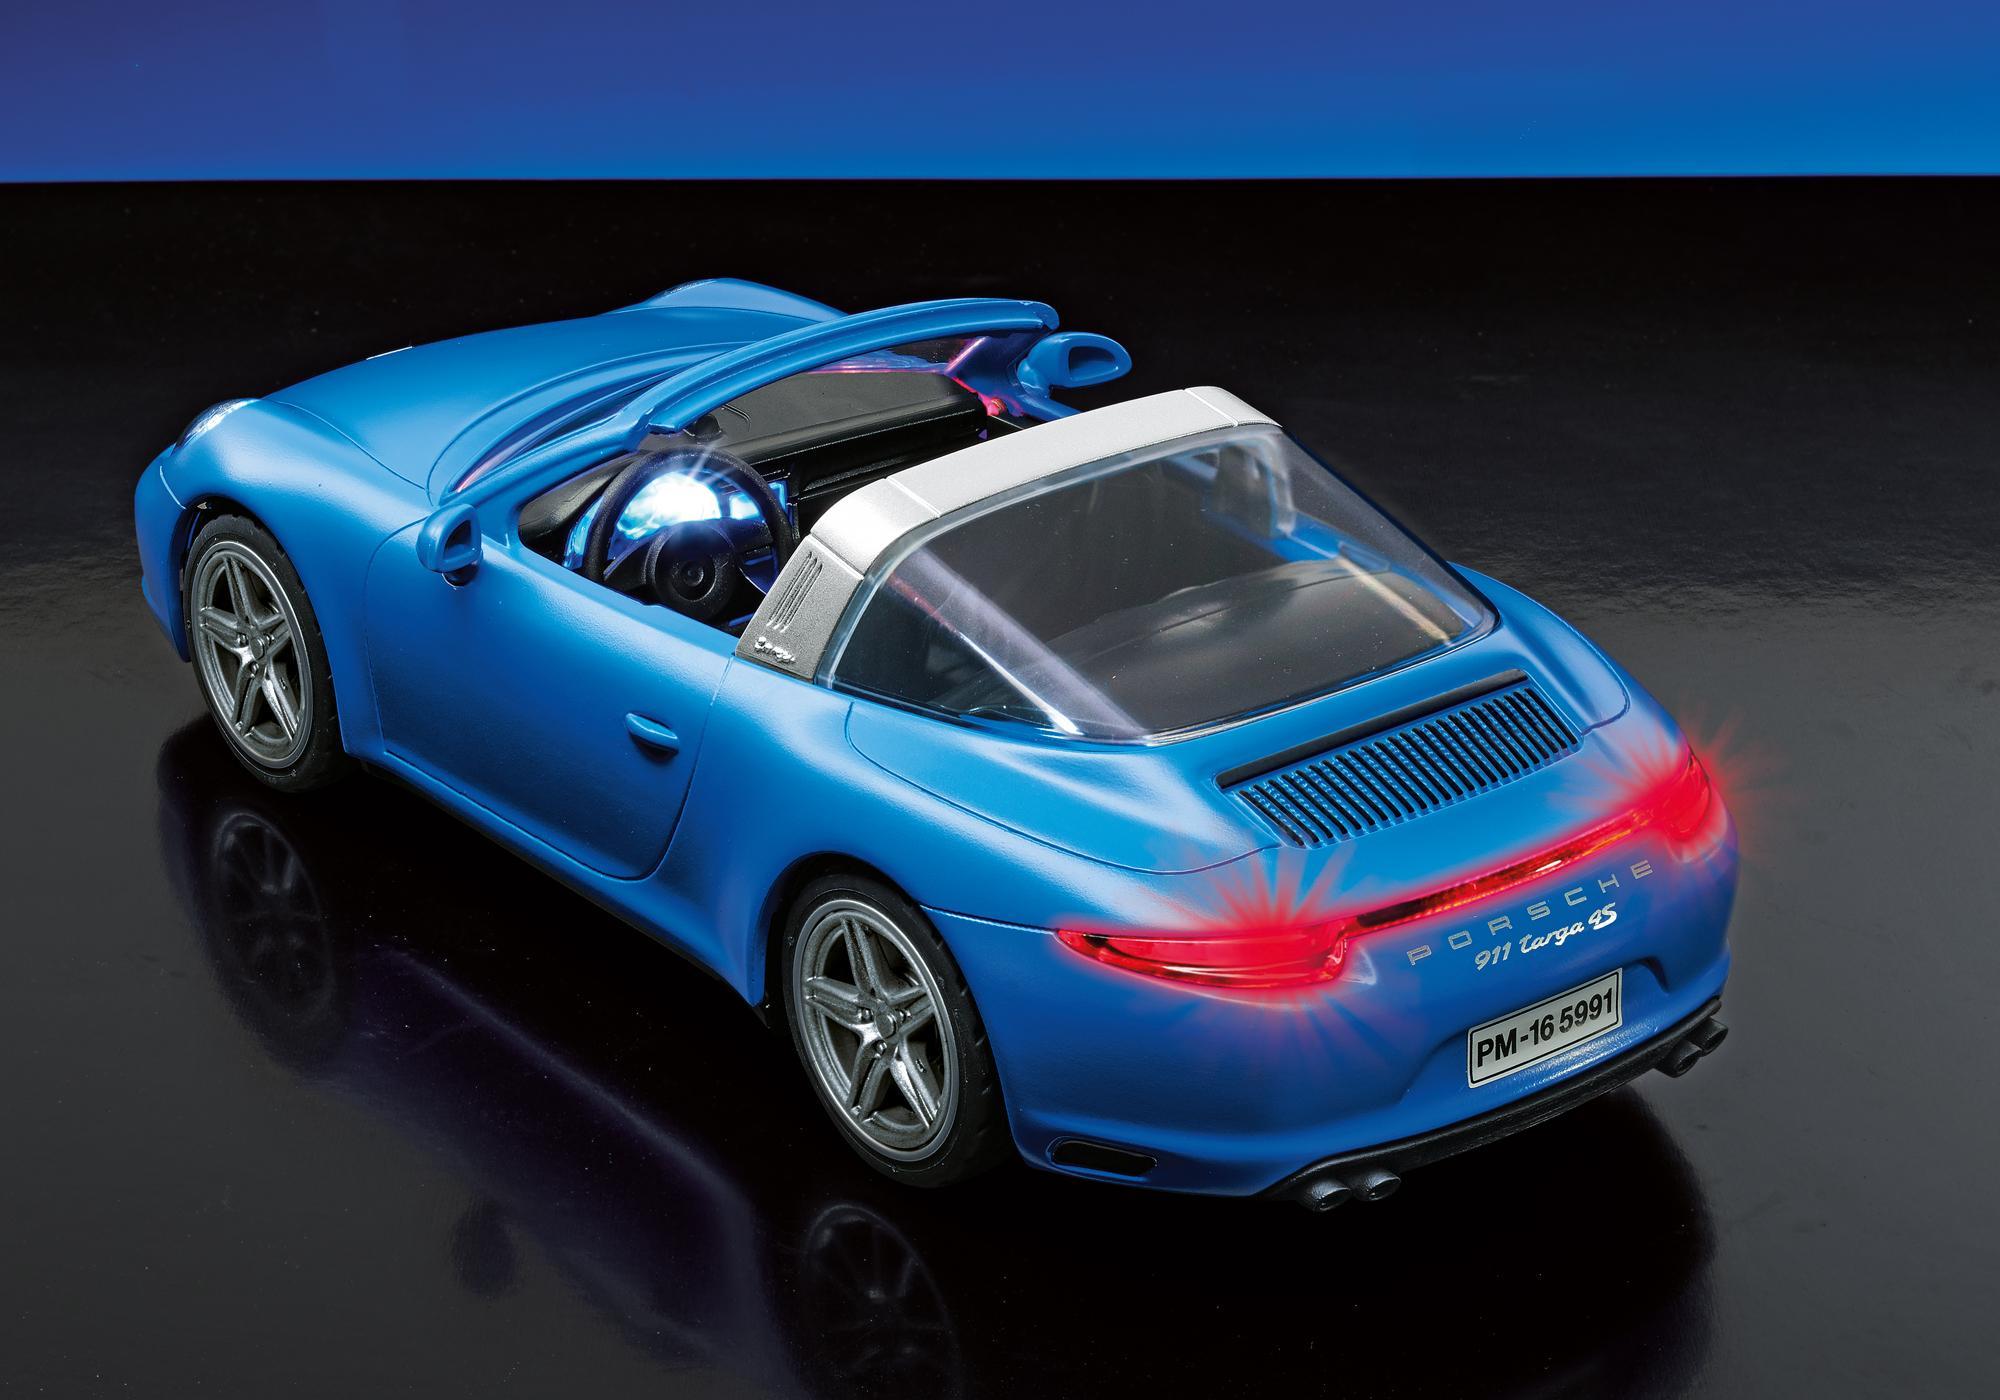 http://media.playmobil.com/i/playmobil/5991_product_extra1/Porsche 911 Targa 4S